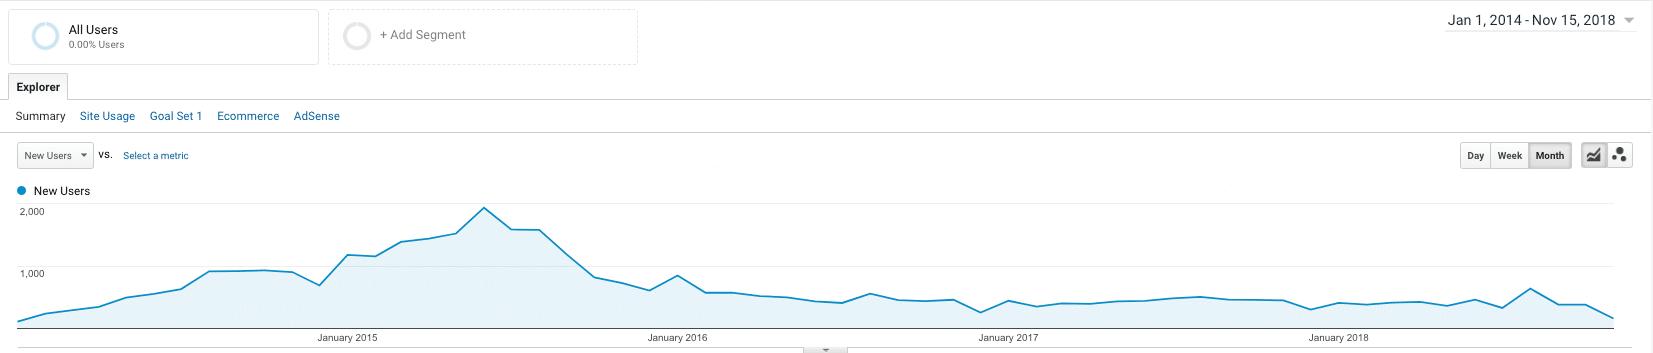 Content Marketing Jan 2014-Nov 15 2018